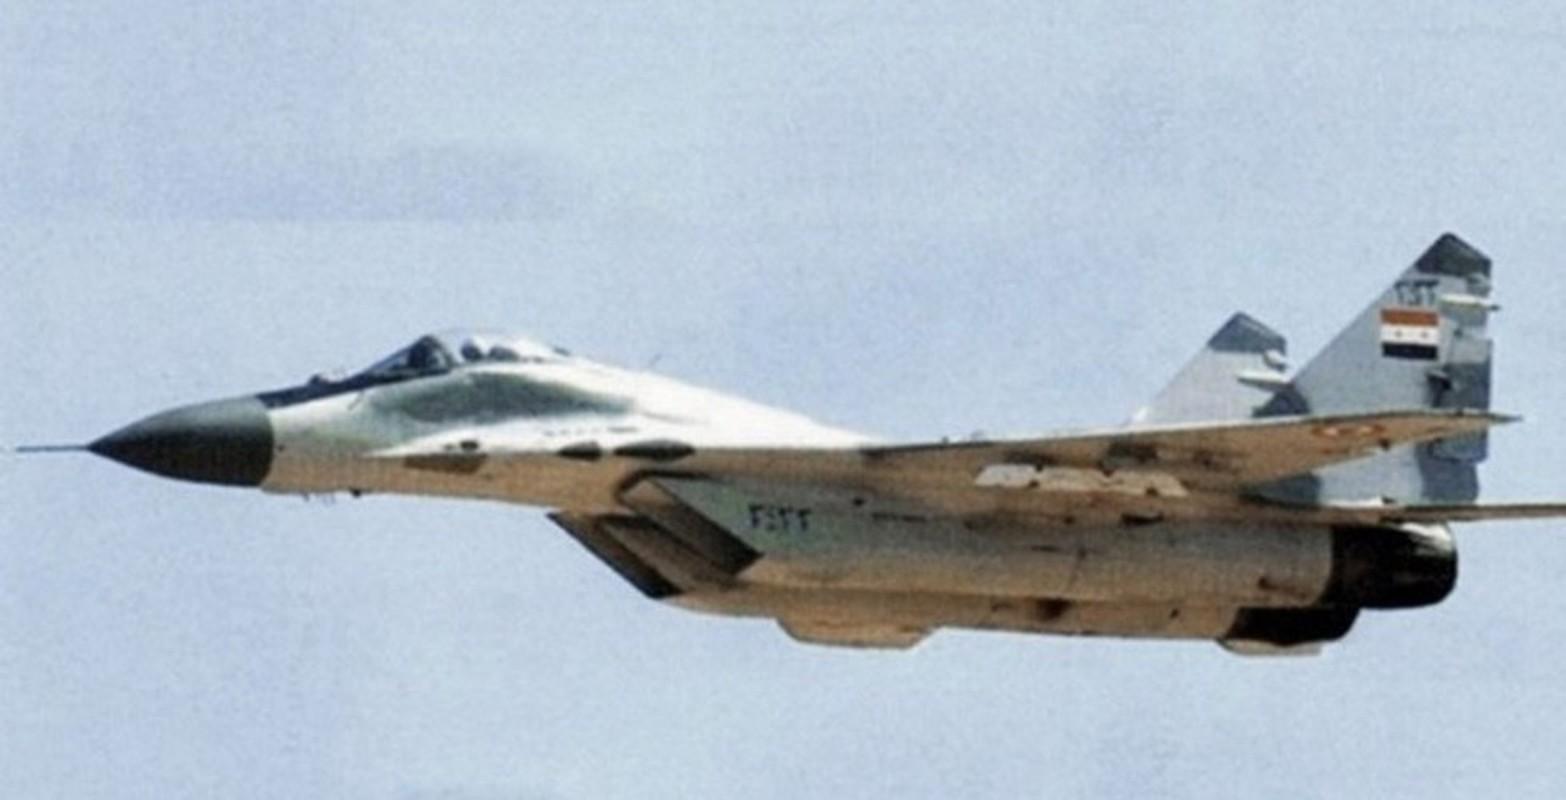 Coi thuong MiG-29 Syria, phong khong Tho Nhi Ky bi qua mat de dang-Hinh-8